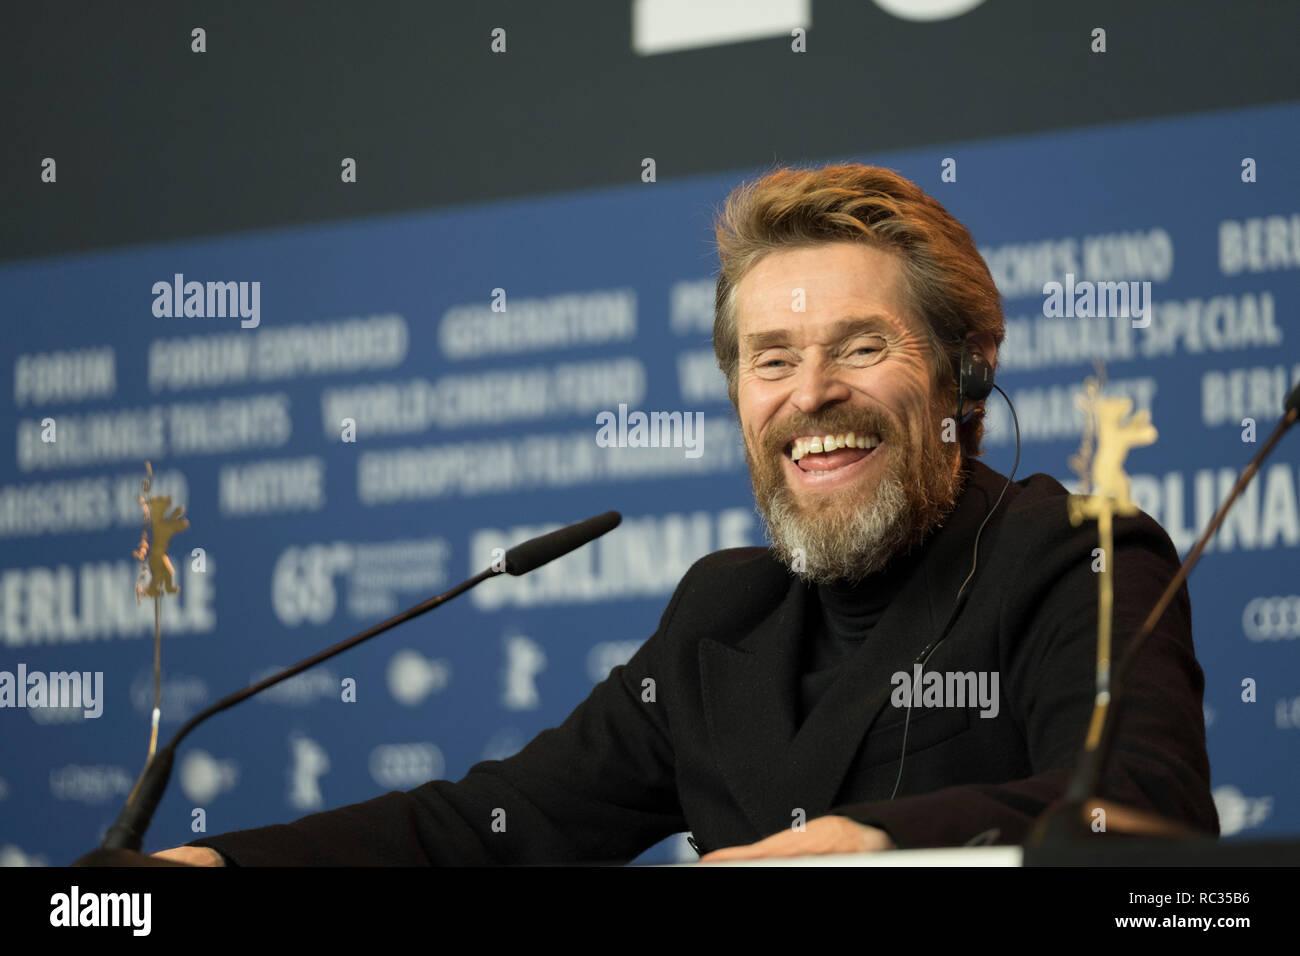 Willem Dafoe - Pressekonferenz, Berlinale 2018, 20. Februar 2018, Berlin Stock Photo